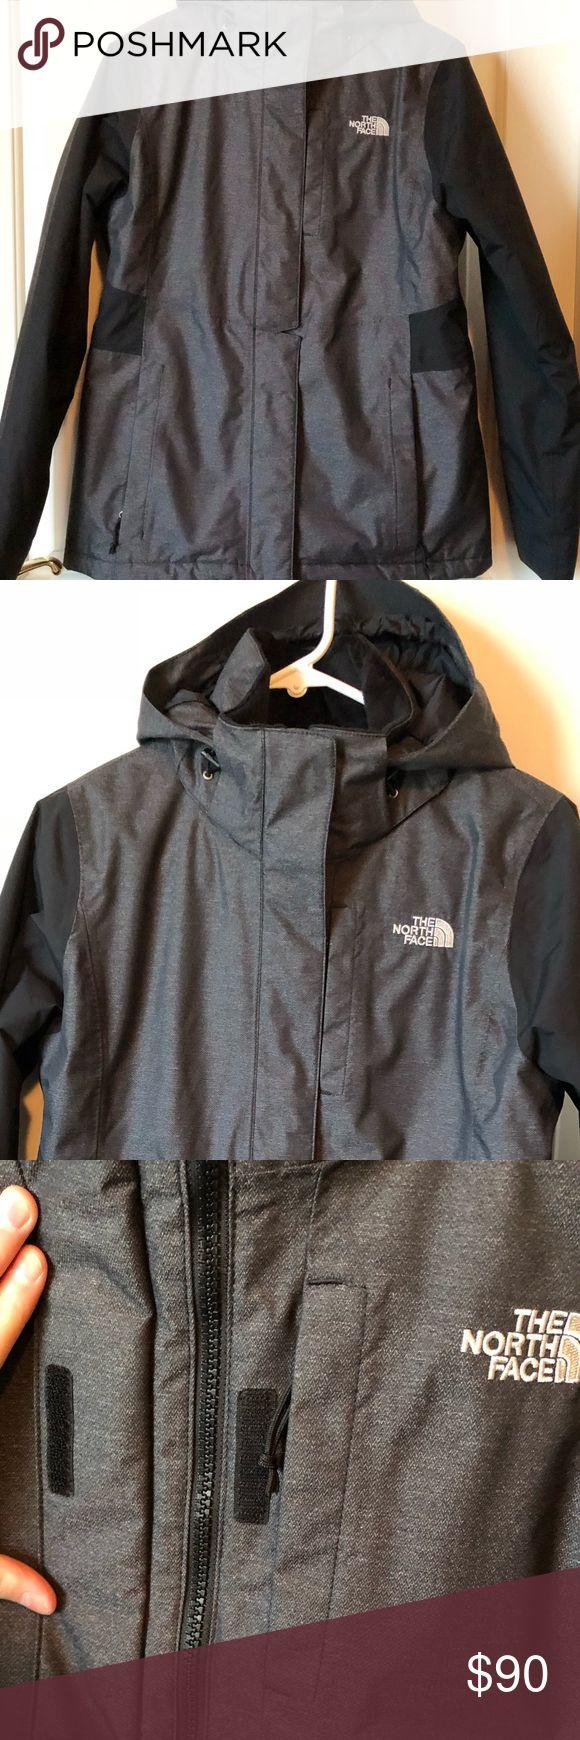 best 25 north face winter jackets ideas on pinterest